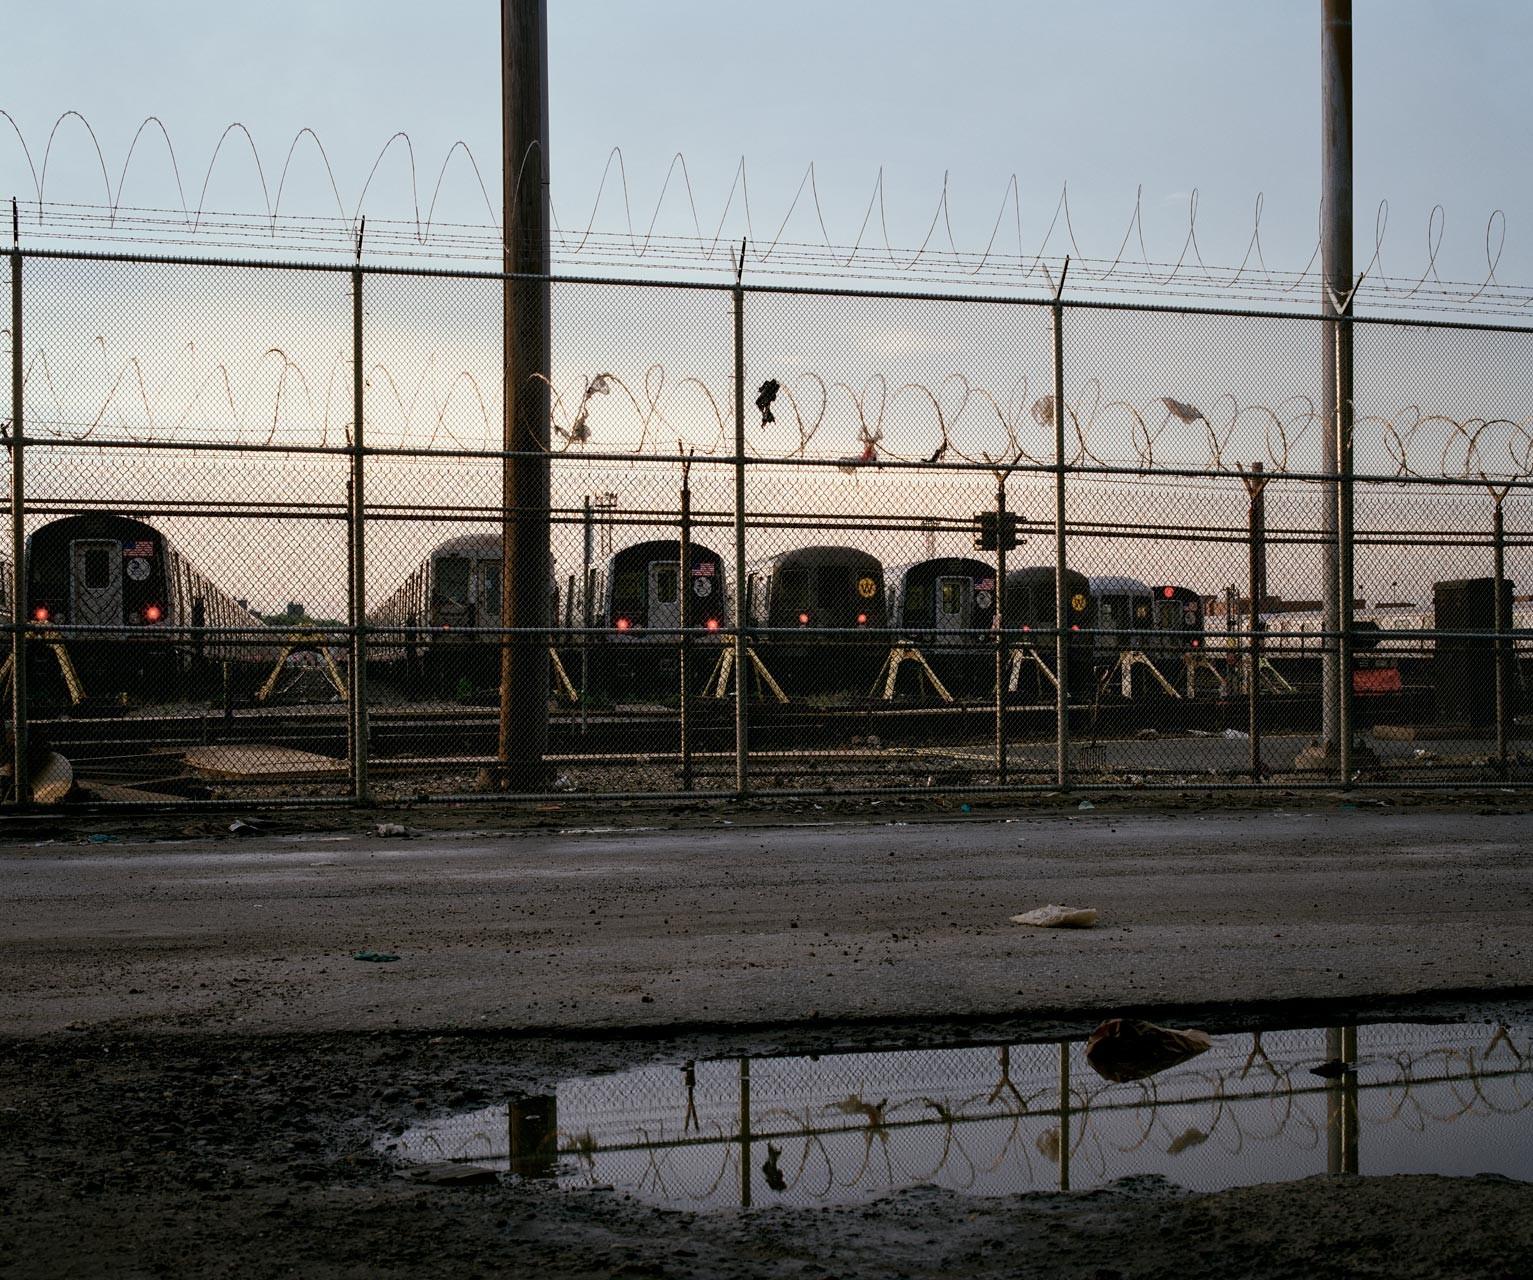 Timo_Stammberger_New_York_Brooklyn_Coney_Island_Subway_Yard_MTA_Trains